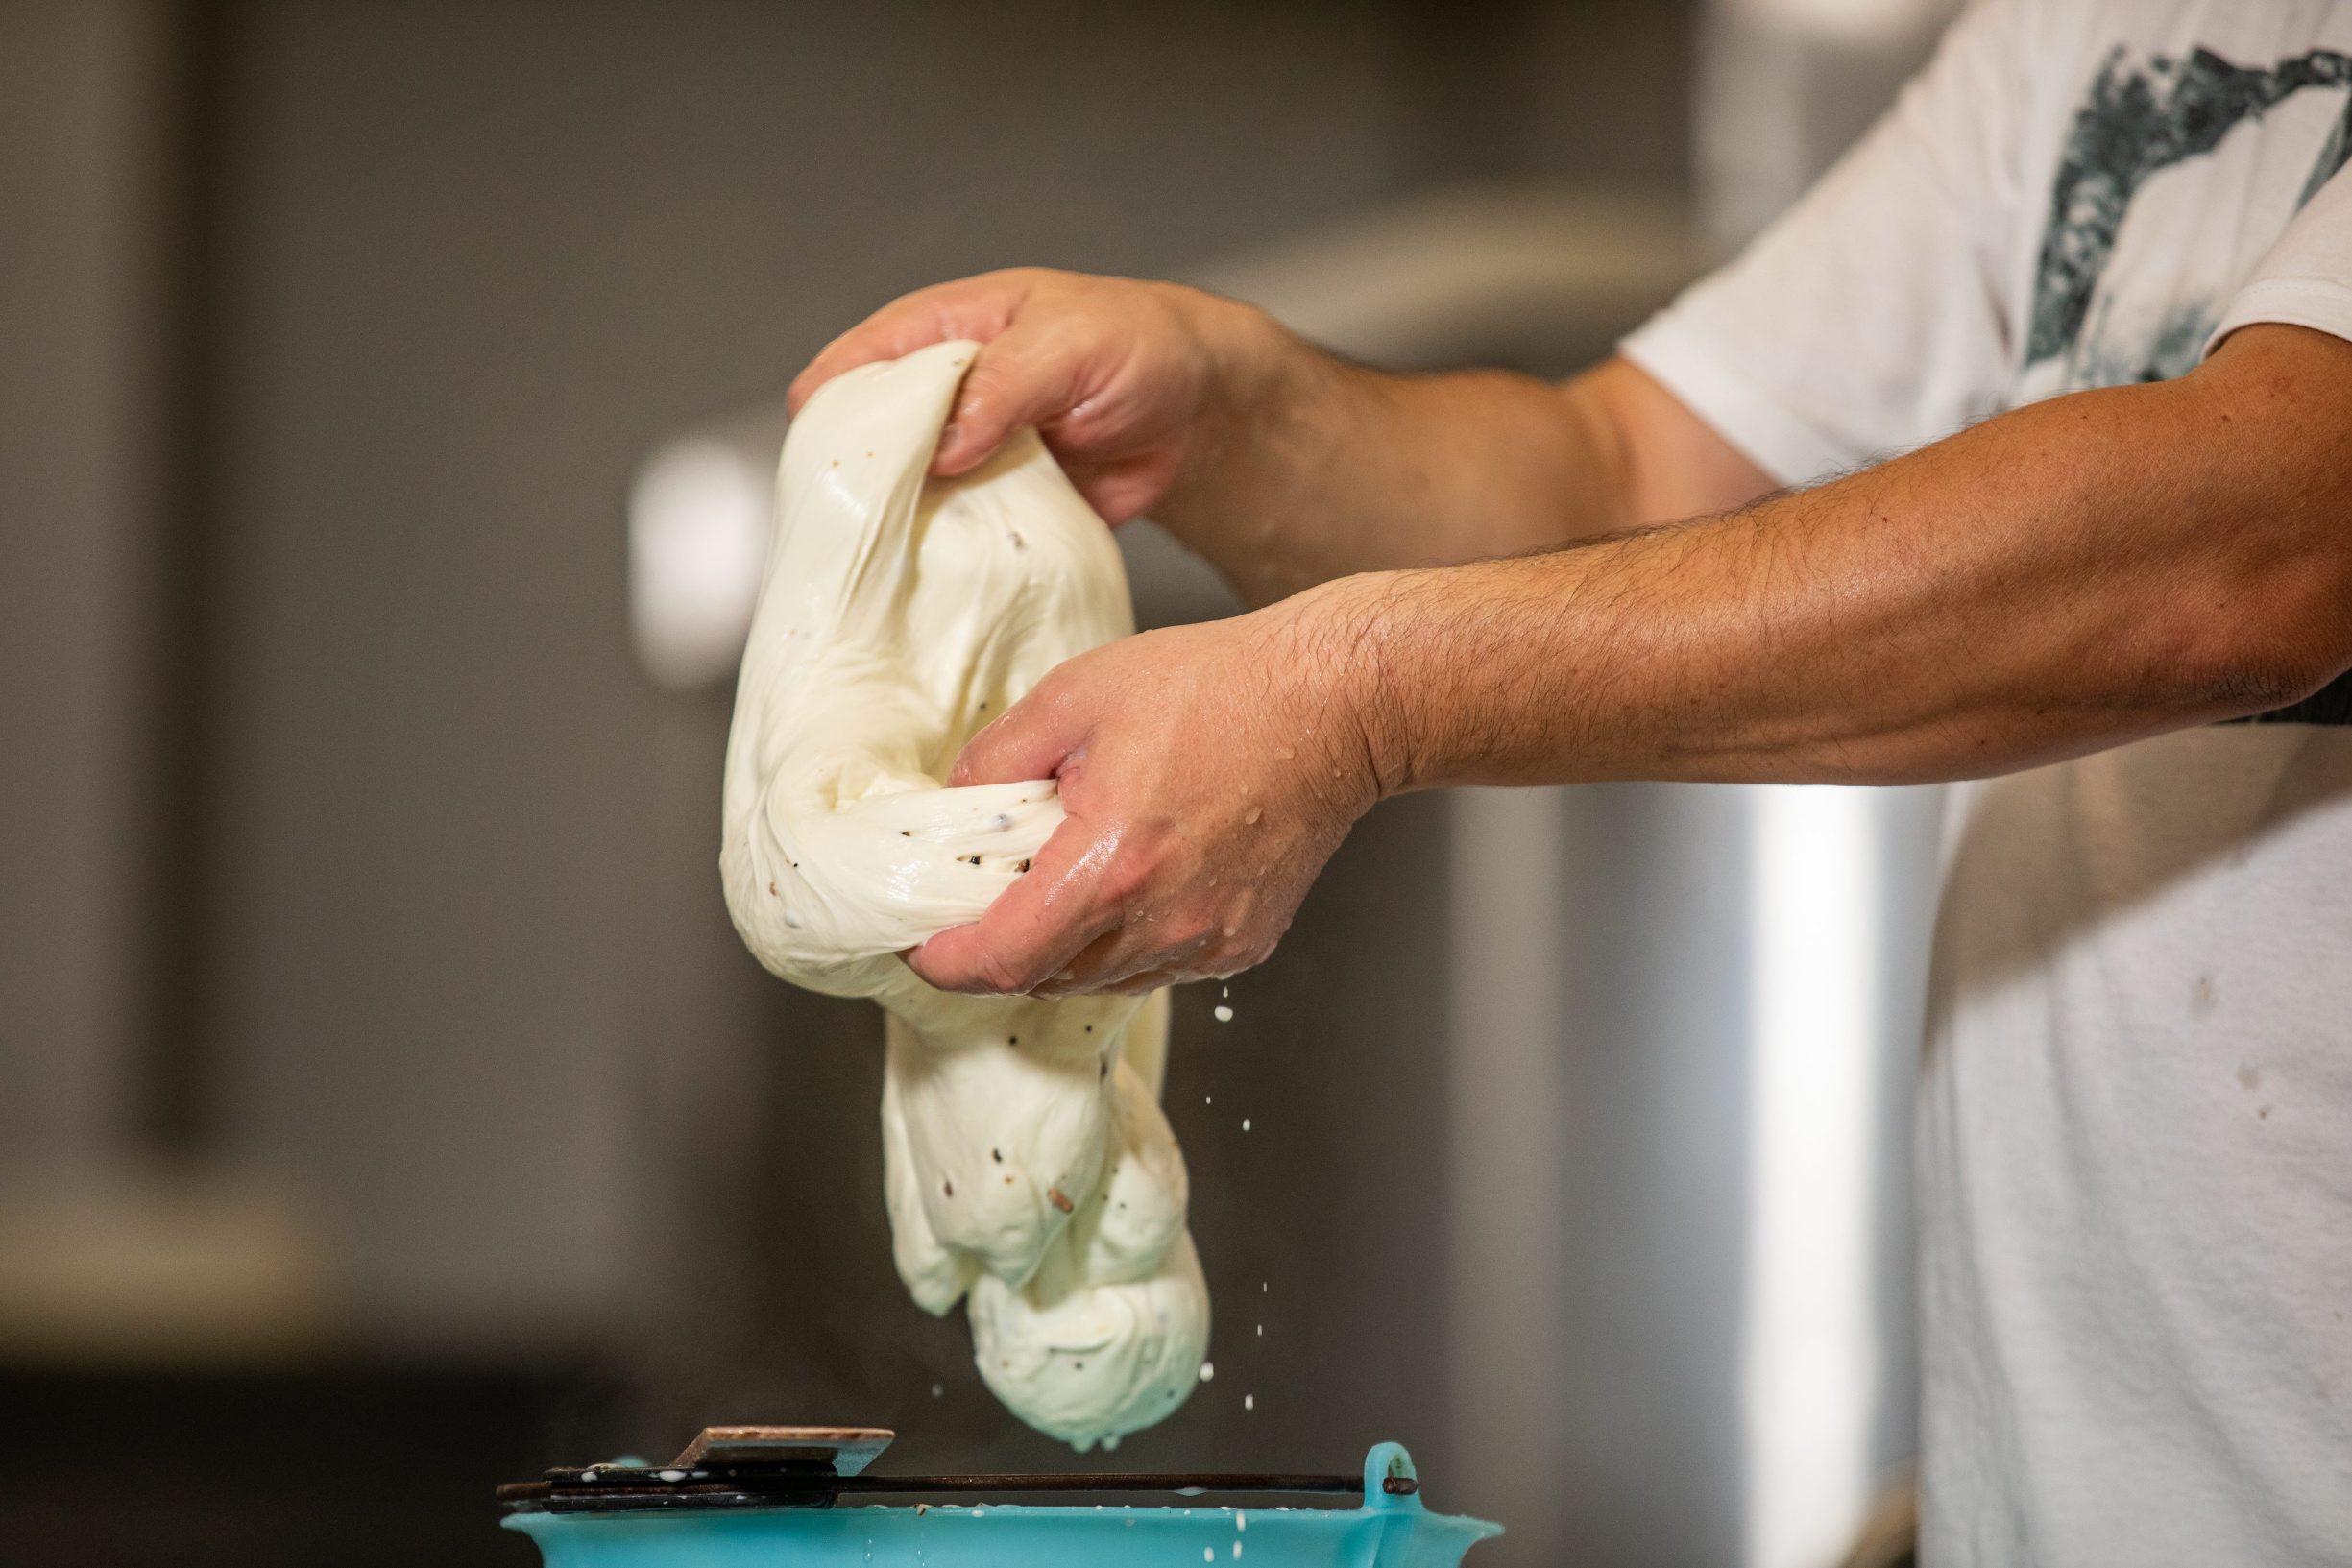 Zminj, 031019. Proizvodnja mozzarelle u Mljekari Latus. Na fotografiji: rucno oblikovanje mozzarelle s tartufima. Foto: Matija Djanjesic / CROPIX